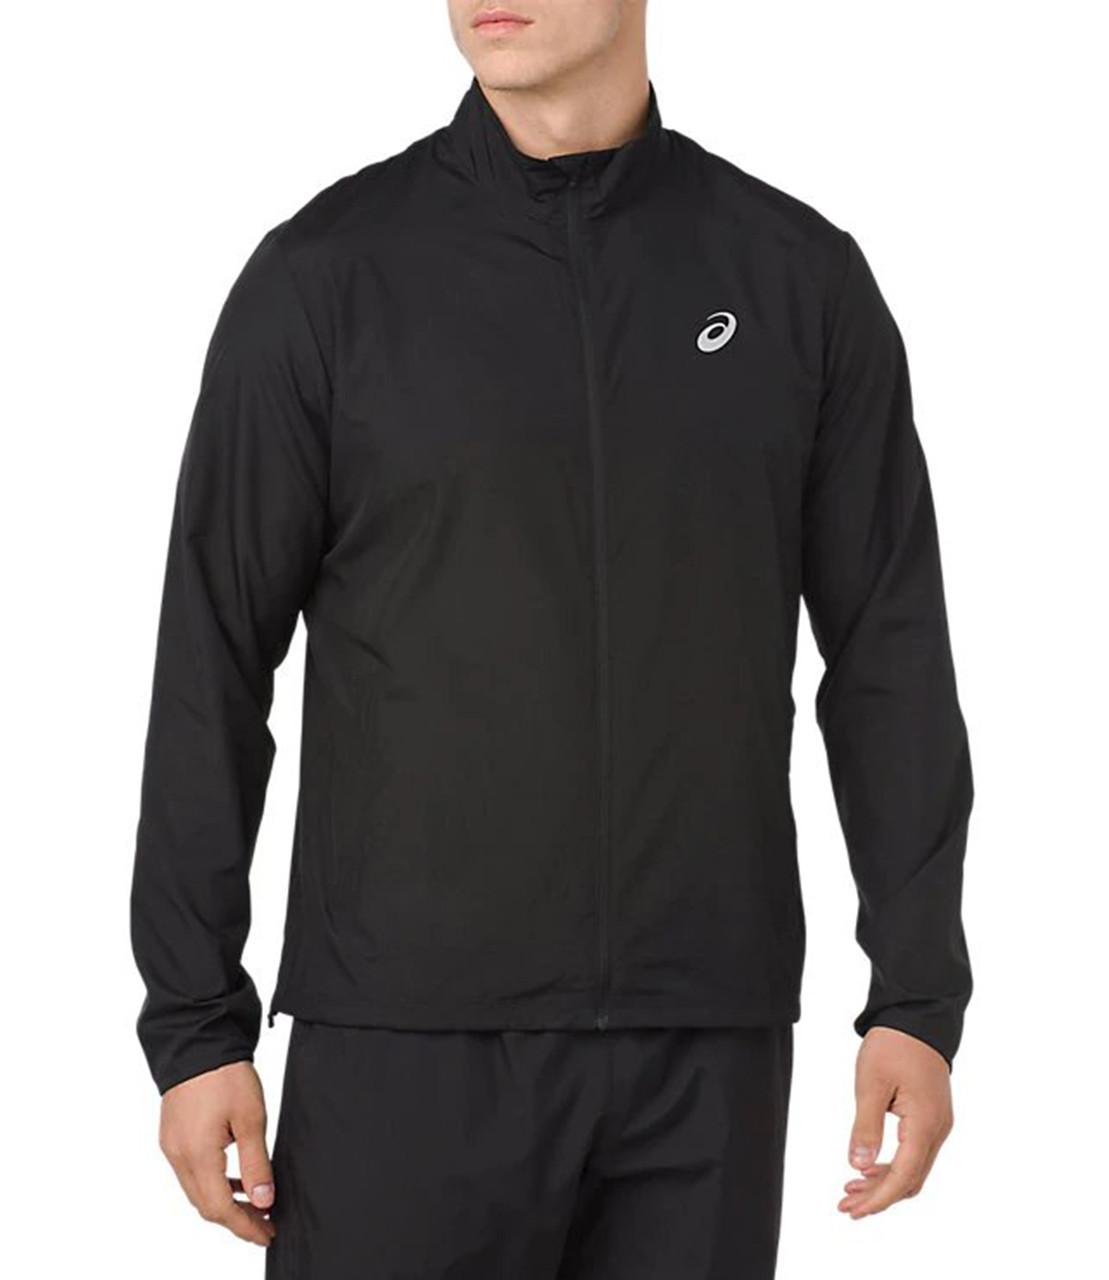 Куртка для бега Asics Silver Jacket 2011A024 002